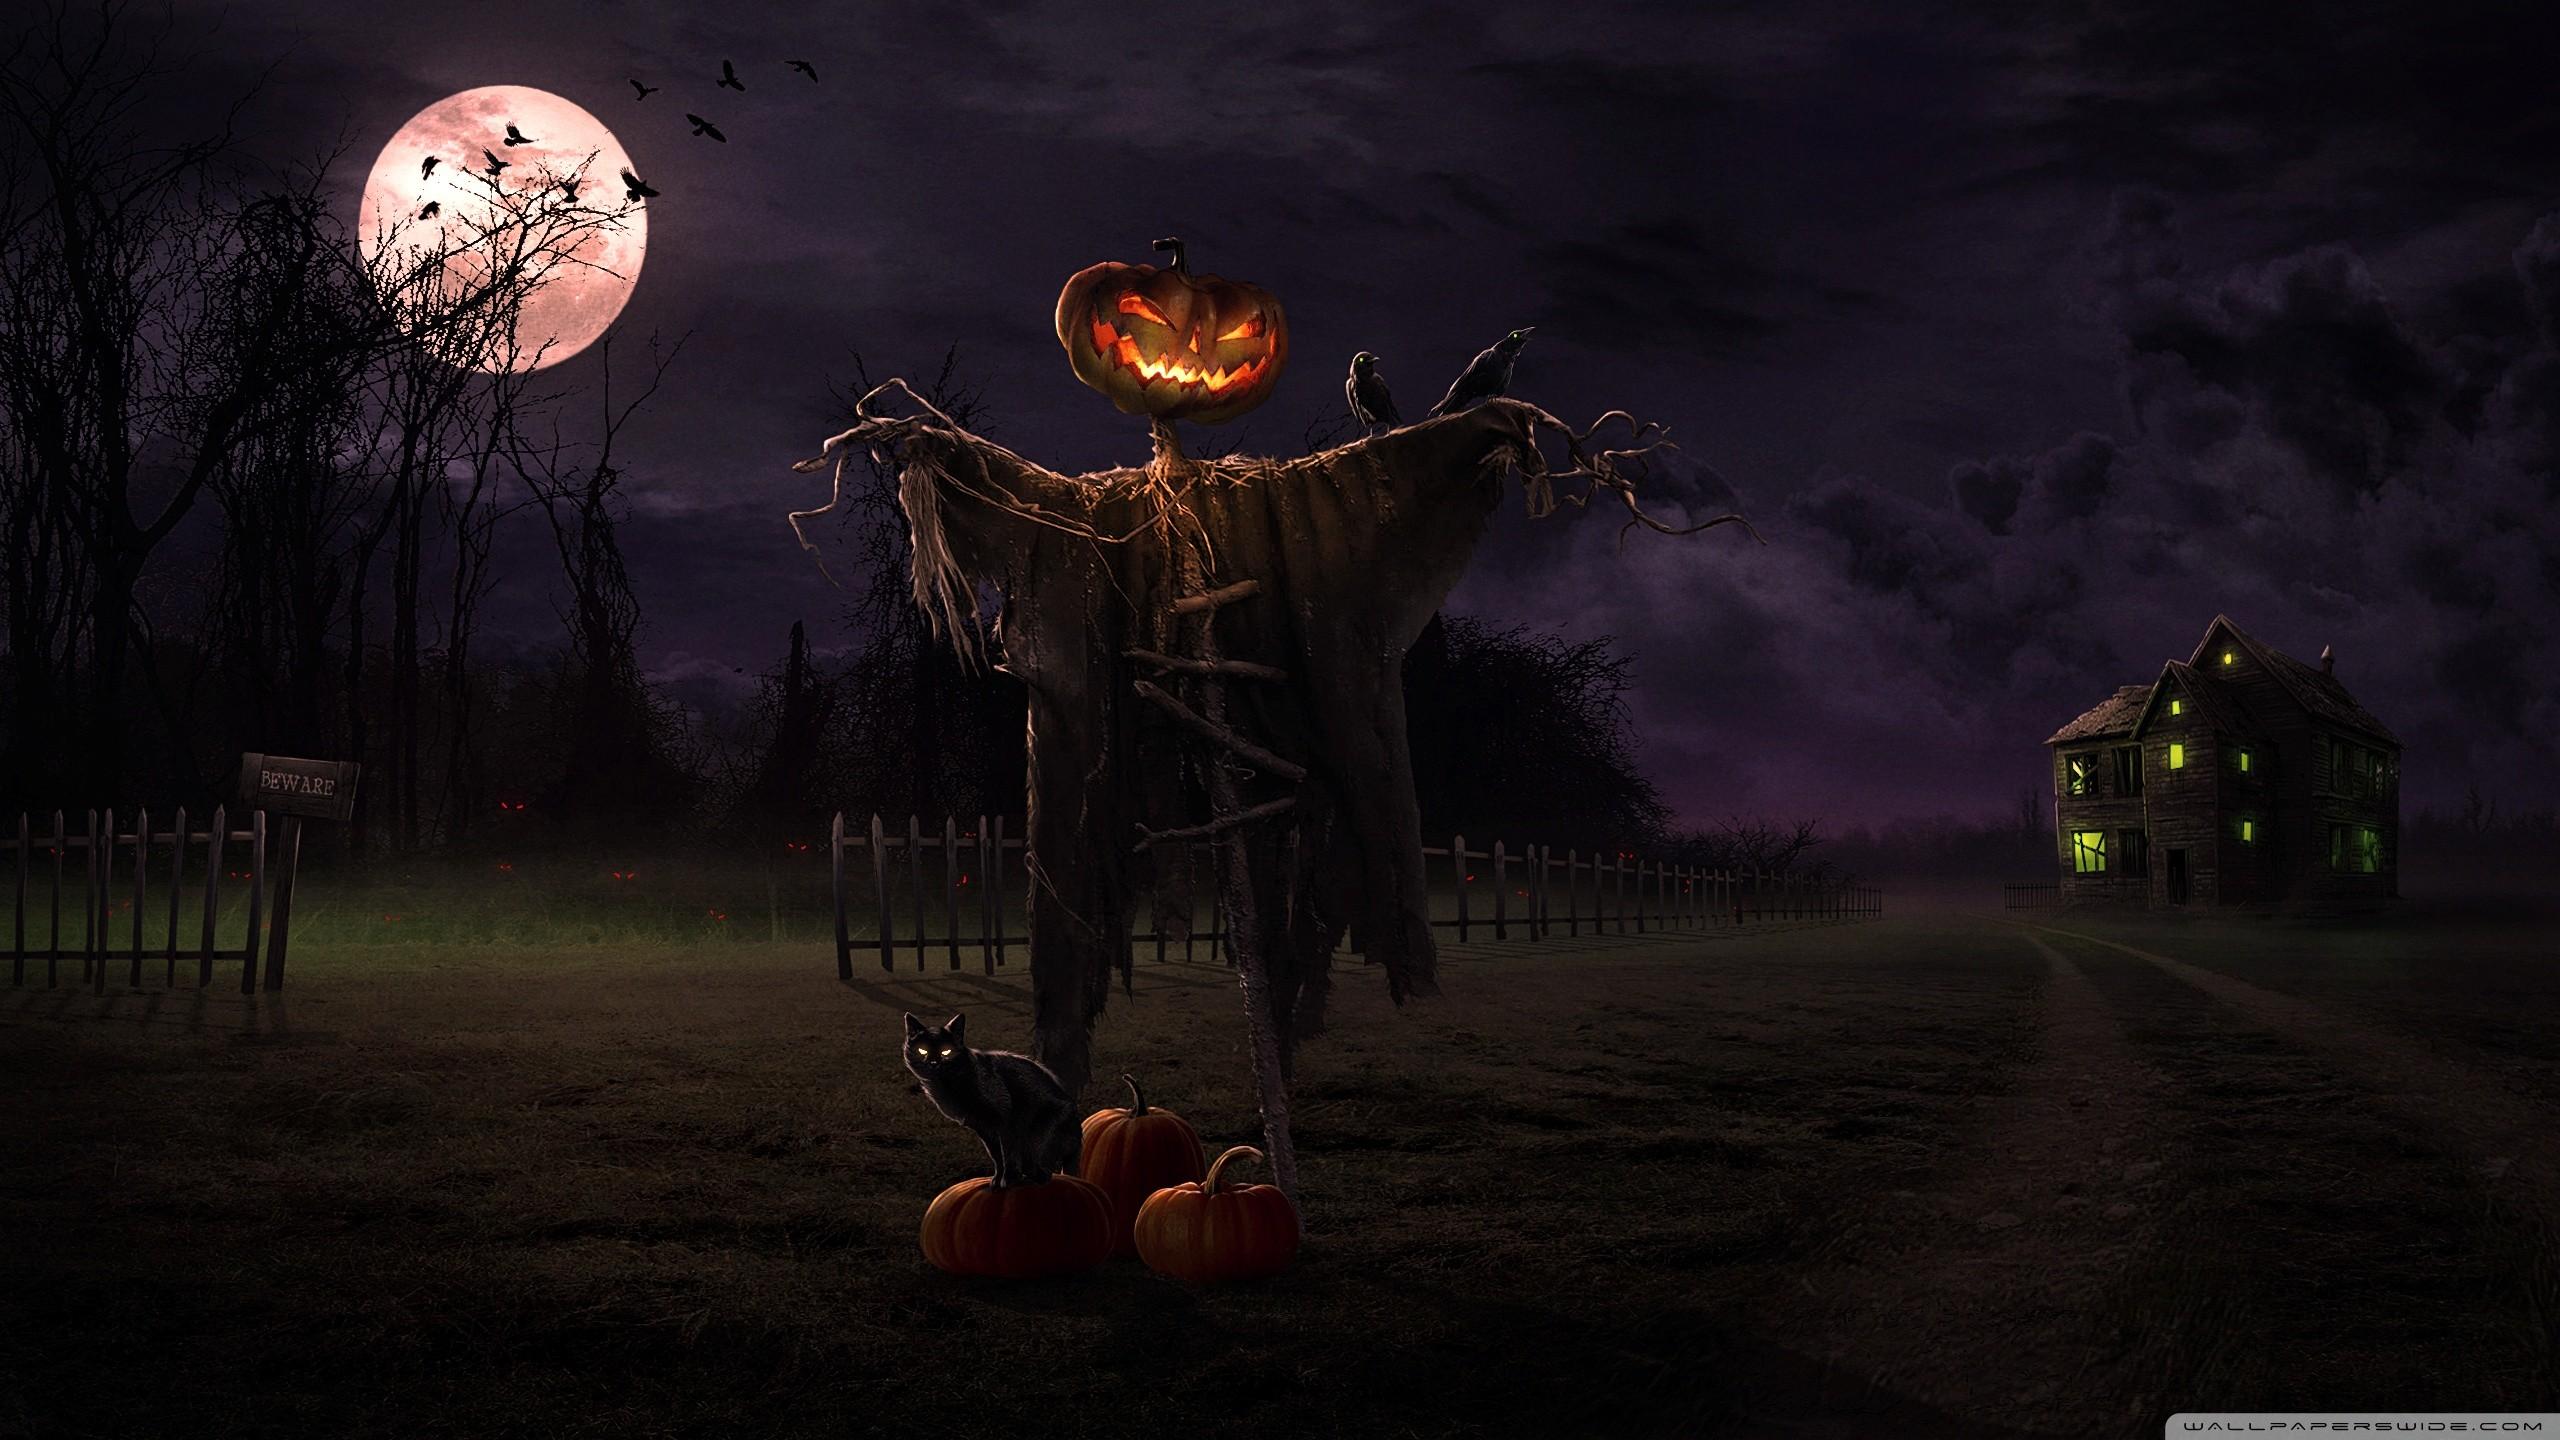 halloween desktop themes wallpaperswide com halloween hd desktop wallpapers  for